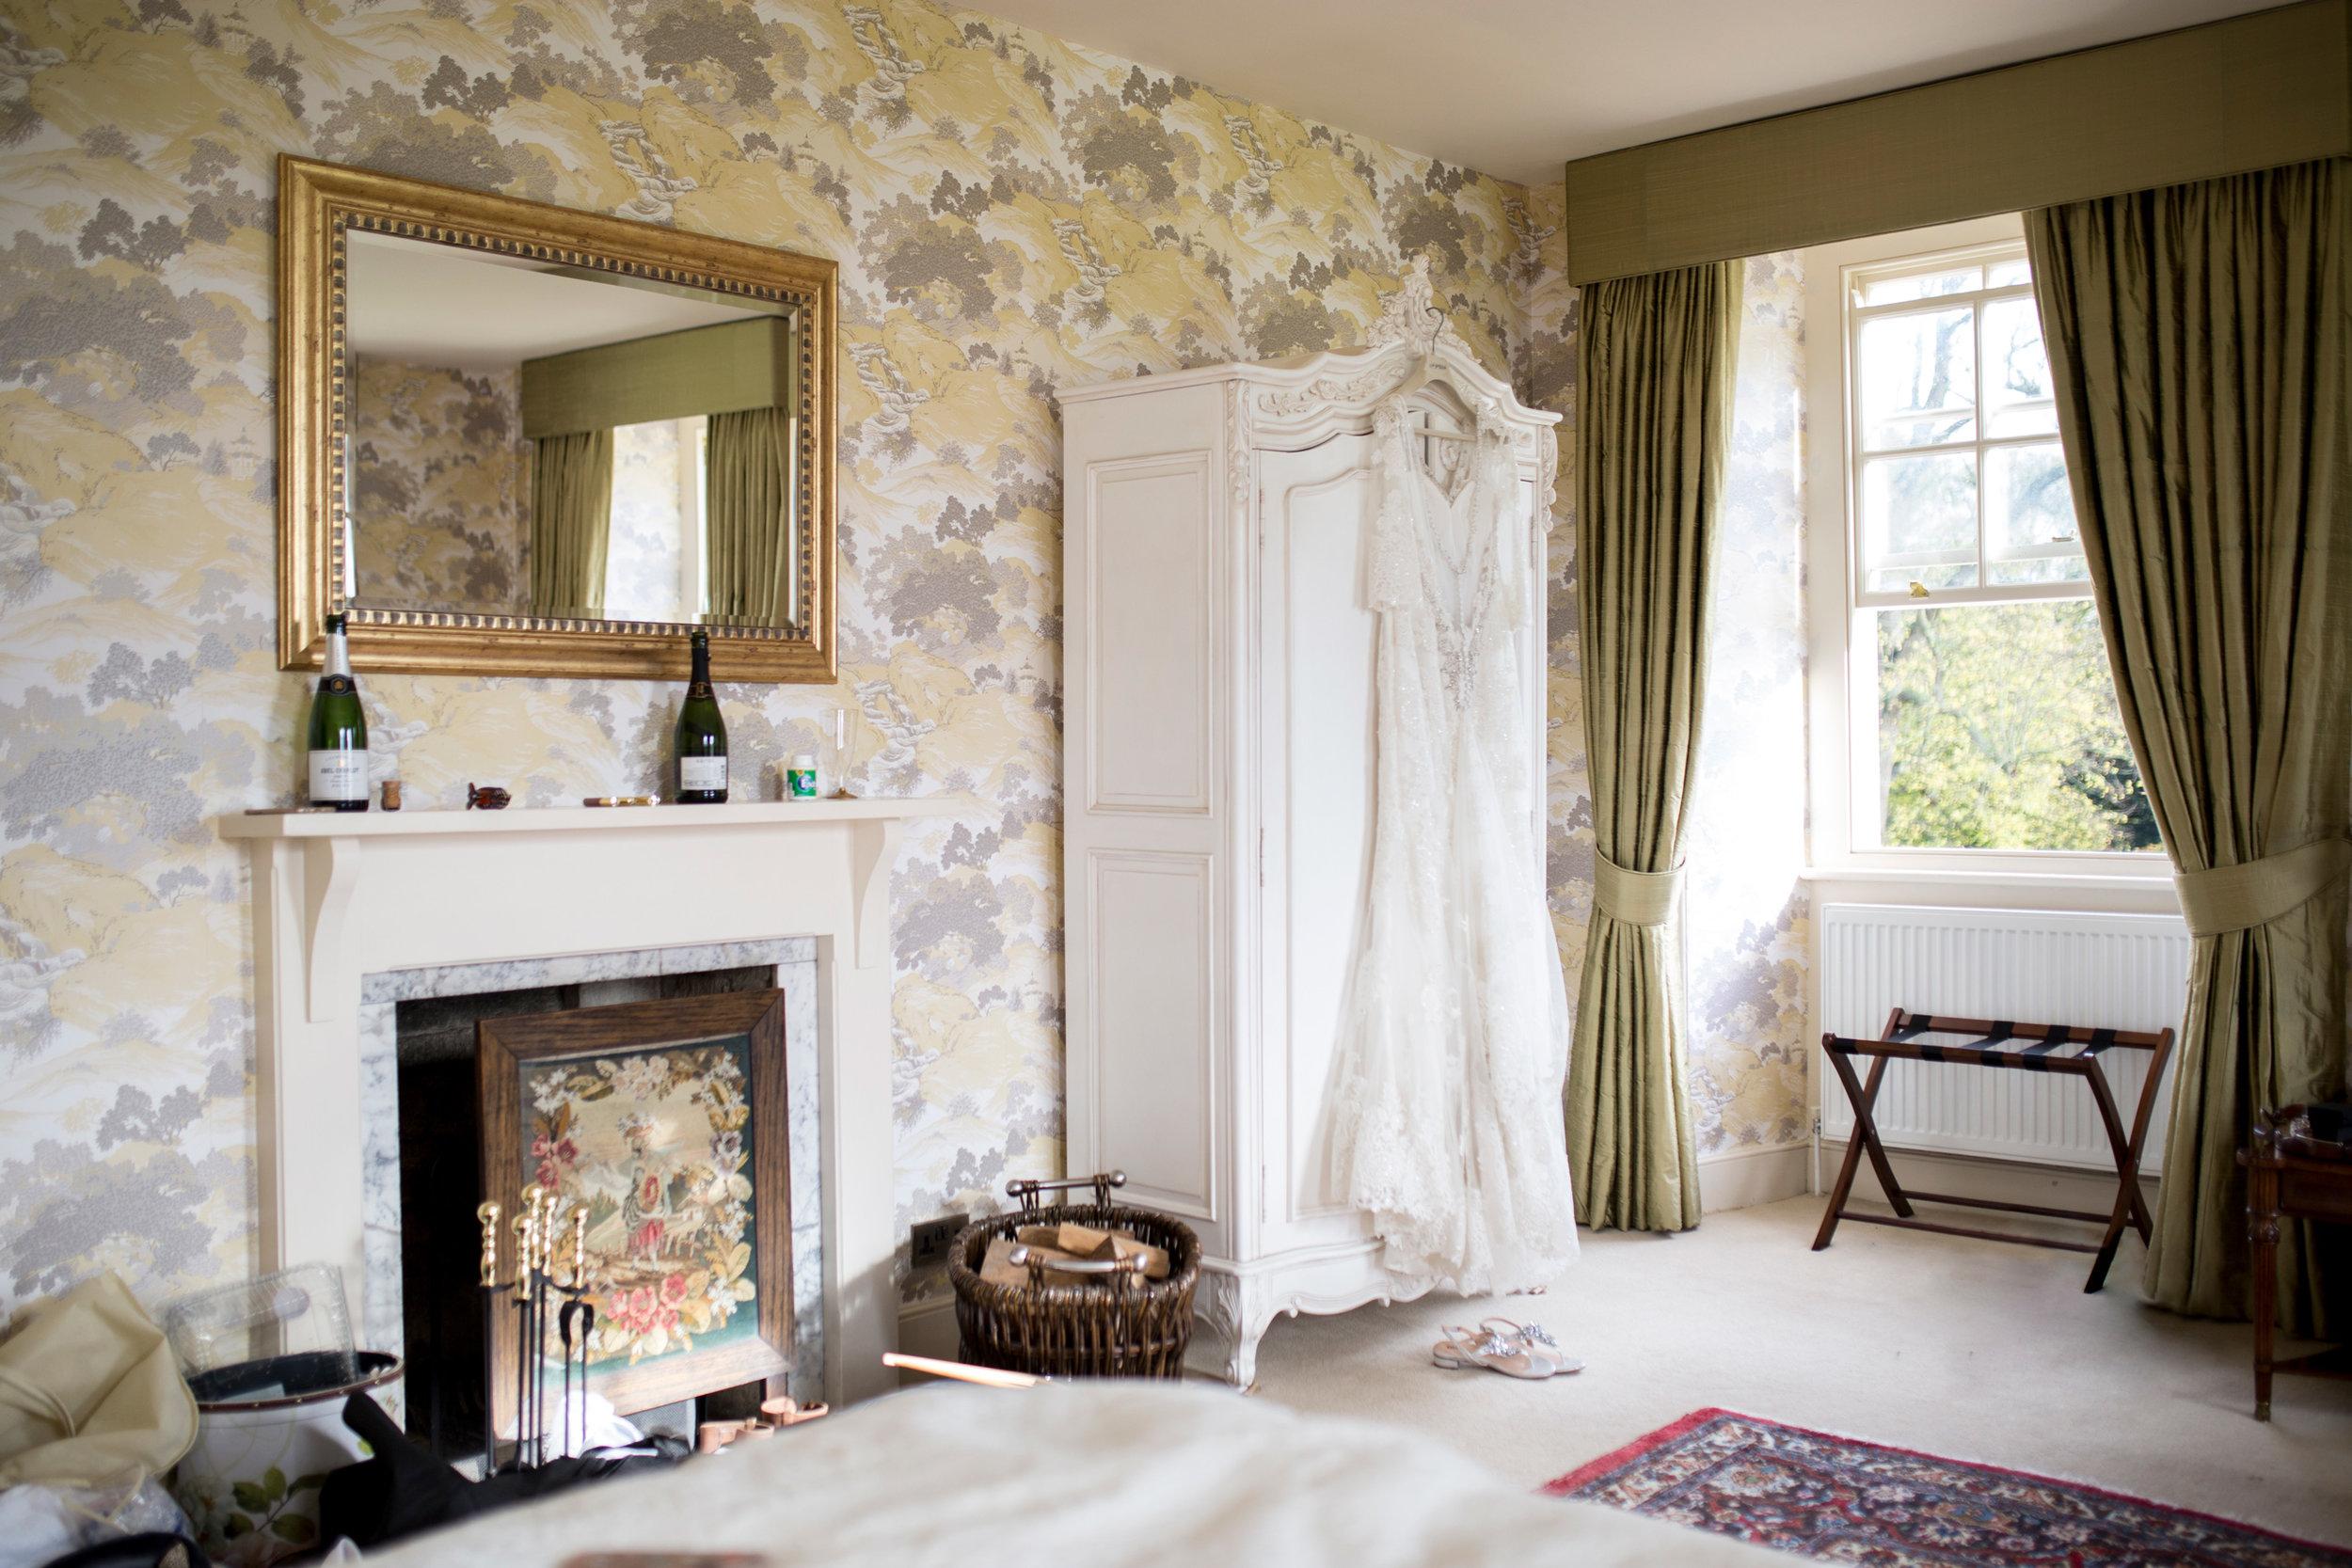 Hinwick House, Bedfordshire Wedding, Bedfordshire Wedding Venue, Bridal Room, Country House Wedding,